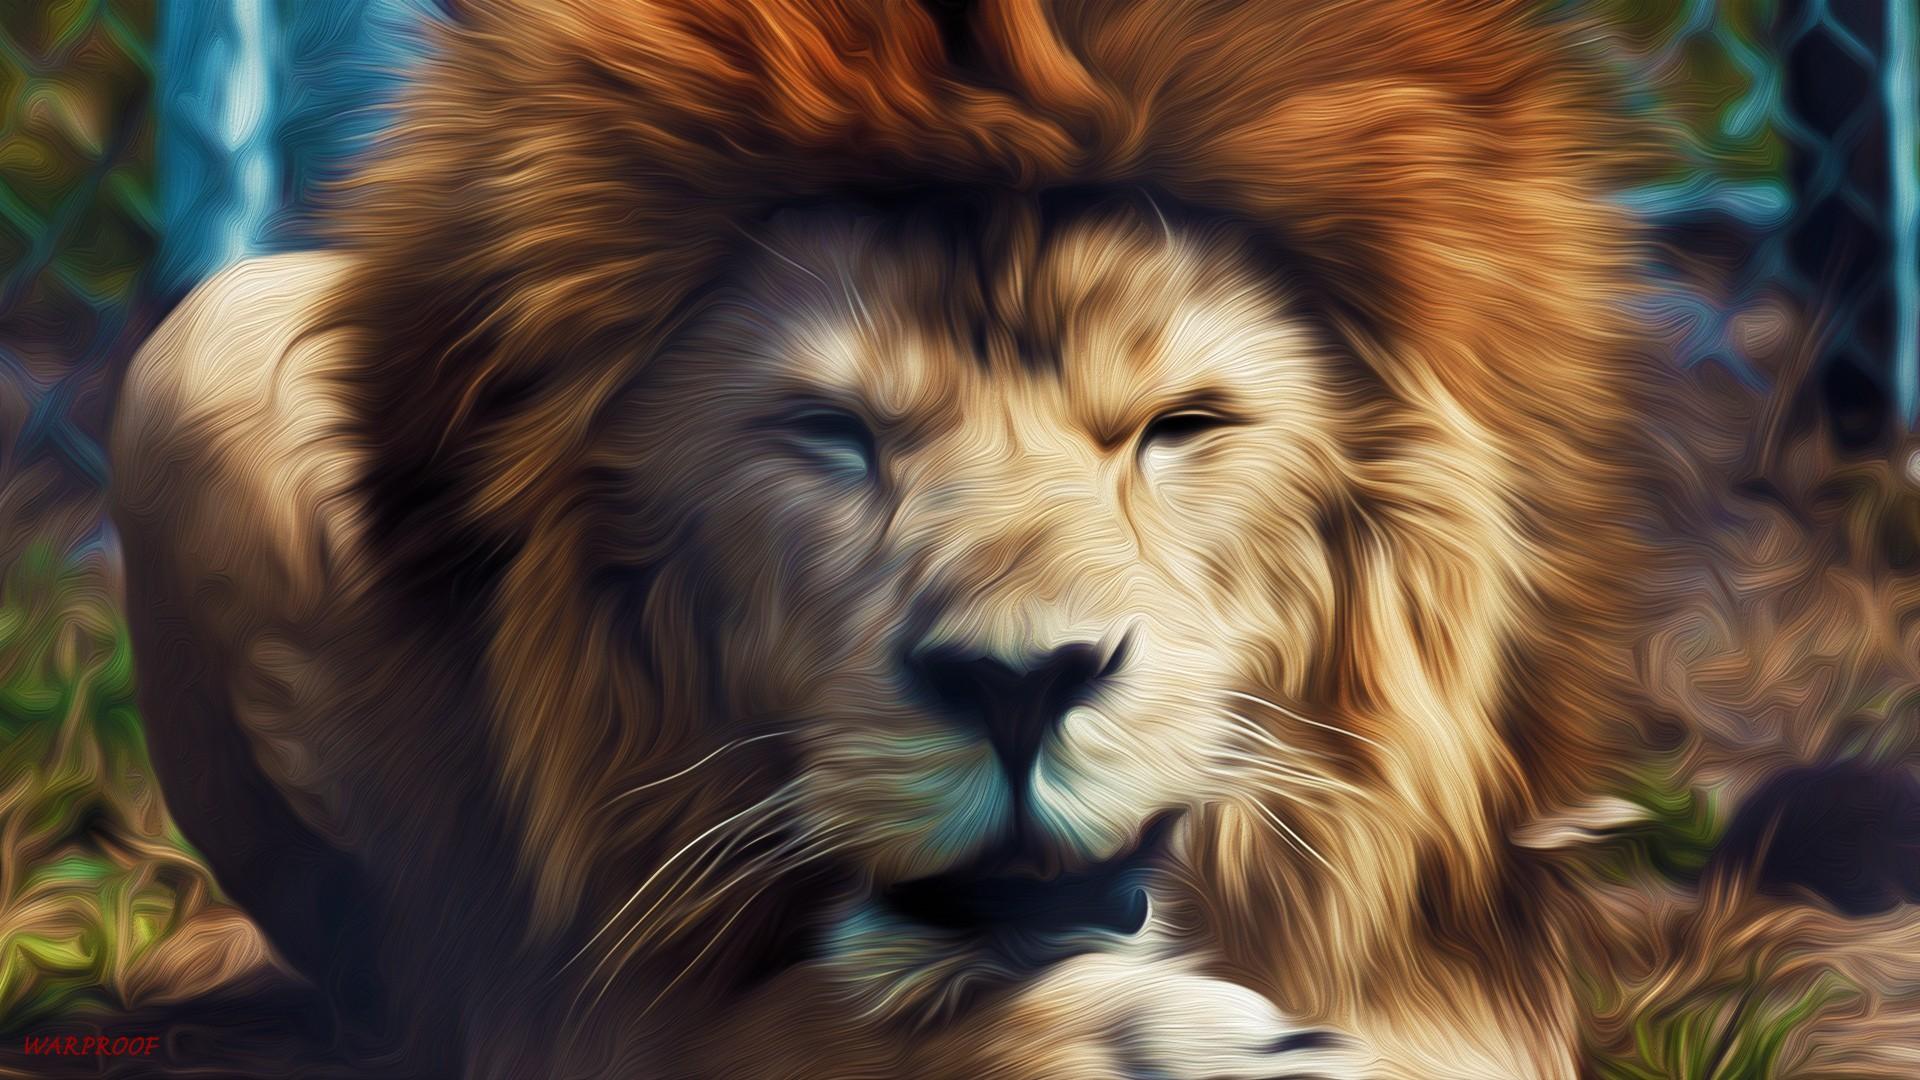 Lion Wallpaper HD ·① Download Free Amazing HD Wallpapers